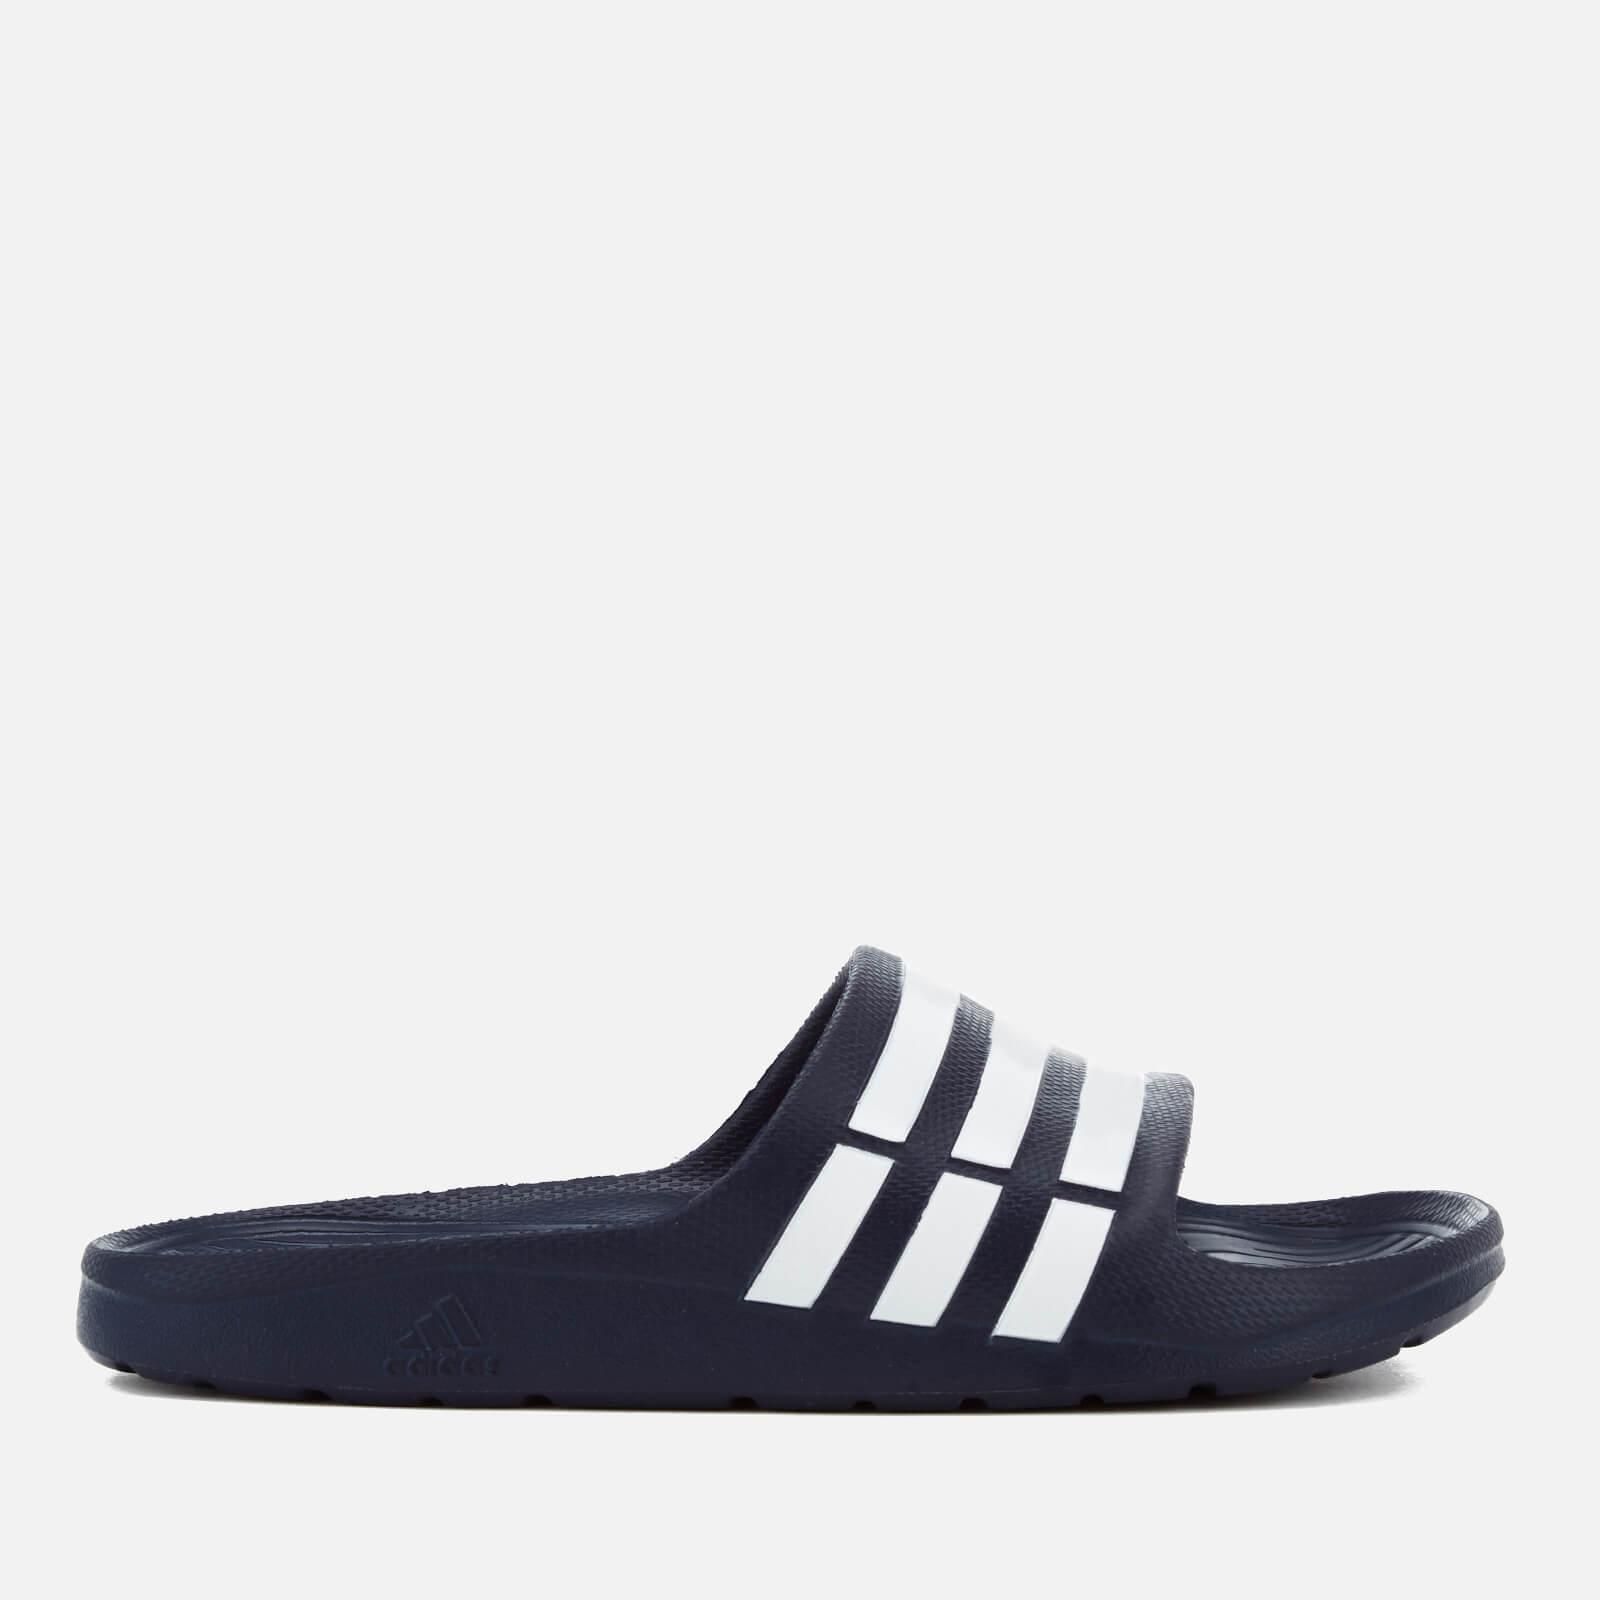 adidas Duramo Slide Sandals - Dark Blue - UK 6